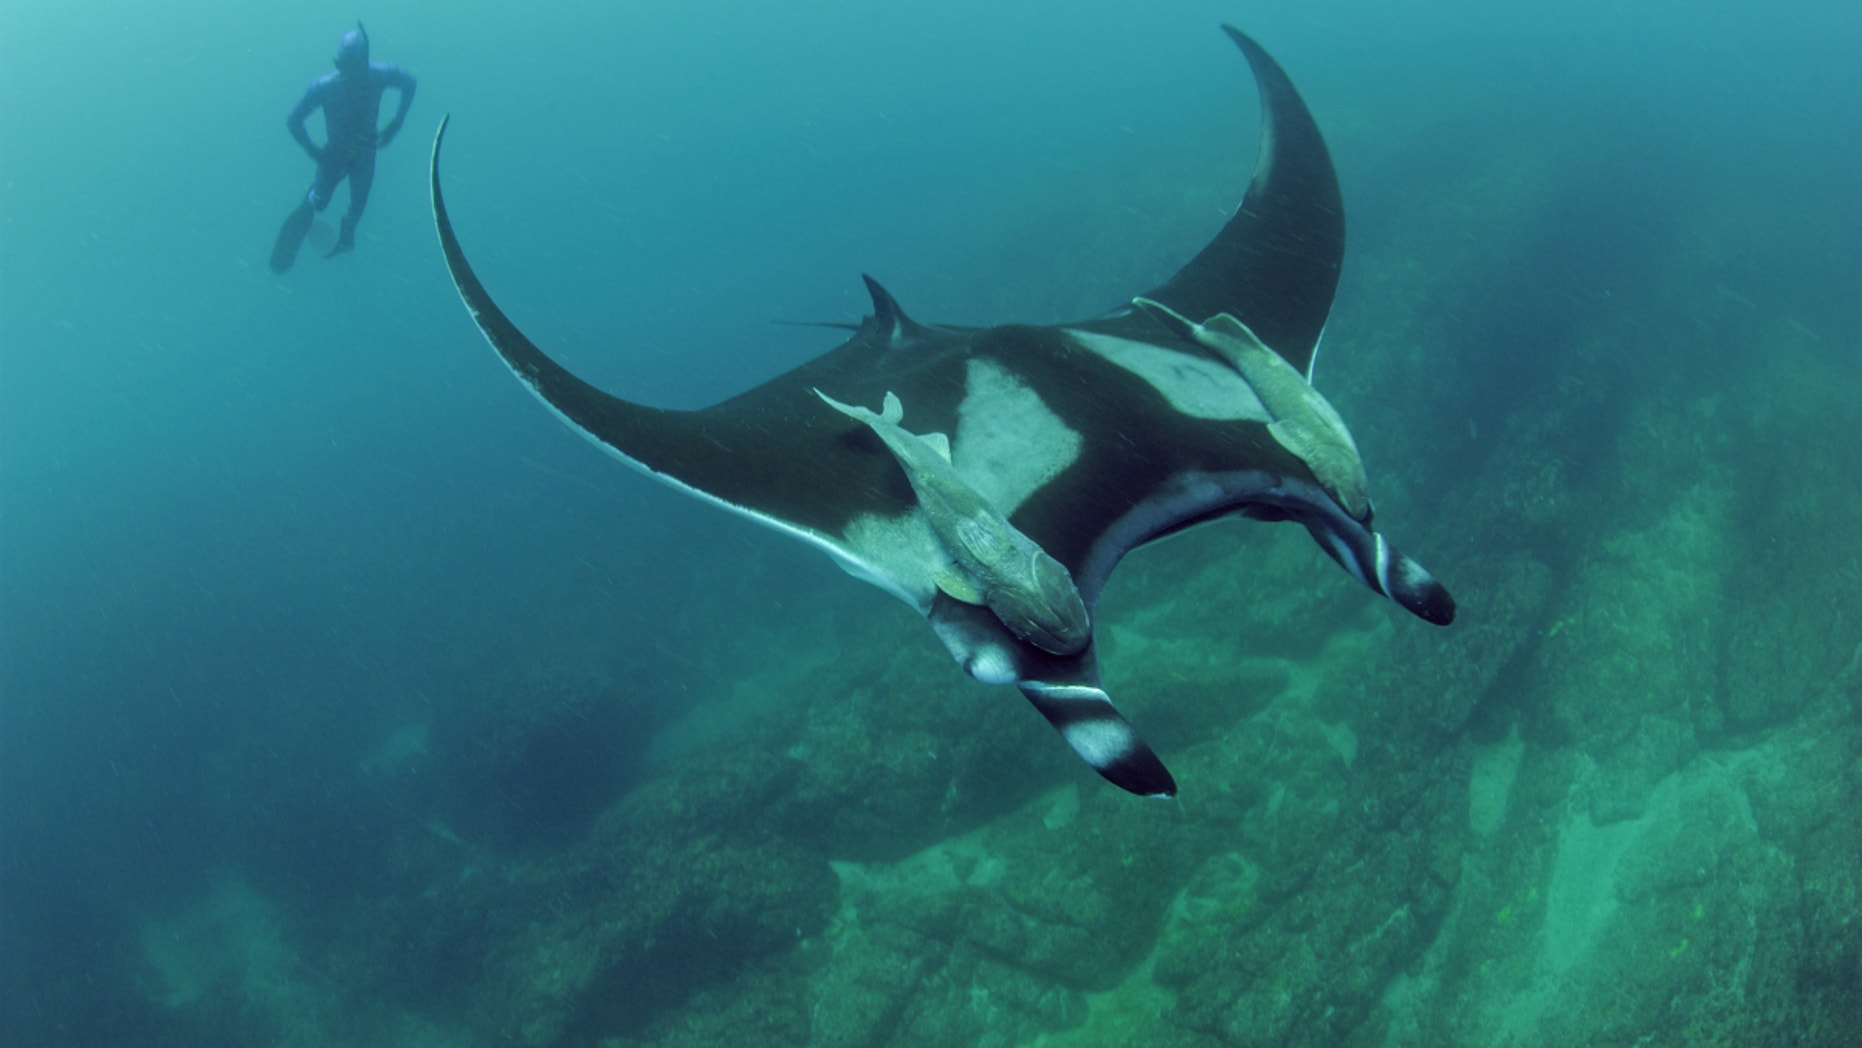 Scripps graduate student Josh Stewart swims near a giant oceanic manta ray at Bahia de Banderas, off Mexico's Pacific coast.